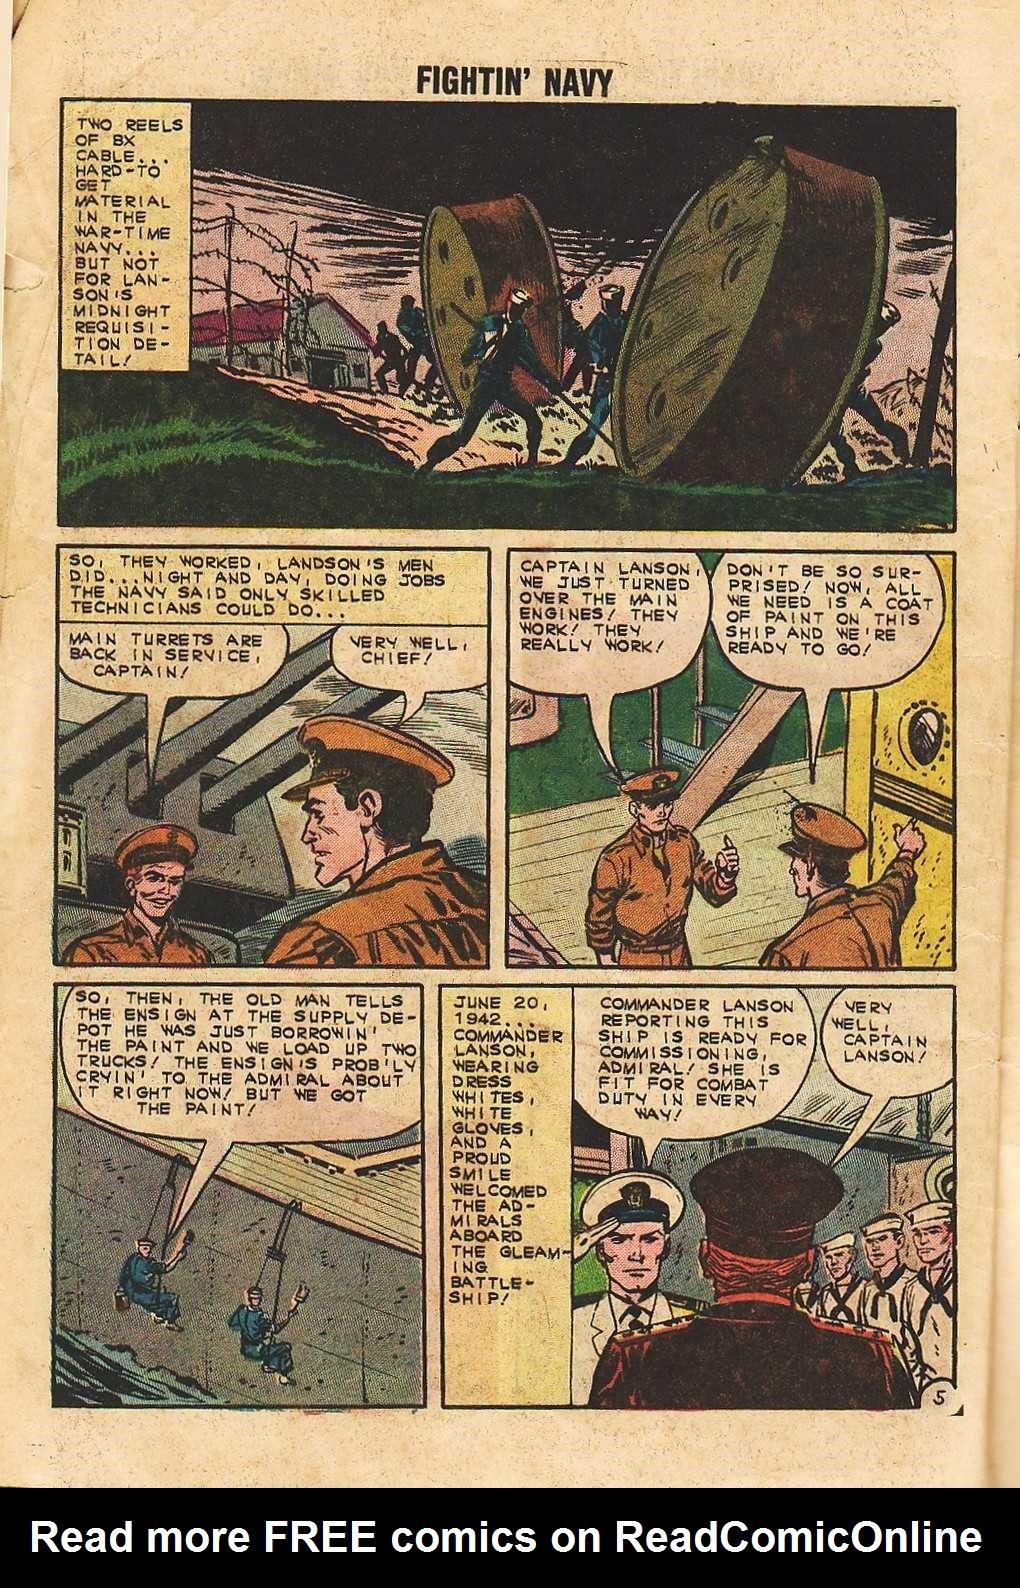 Read online Fightin' Navy comic -  Issue #105 - 8